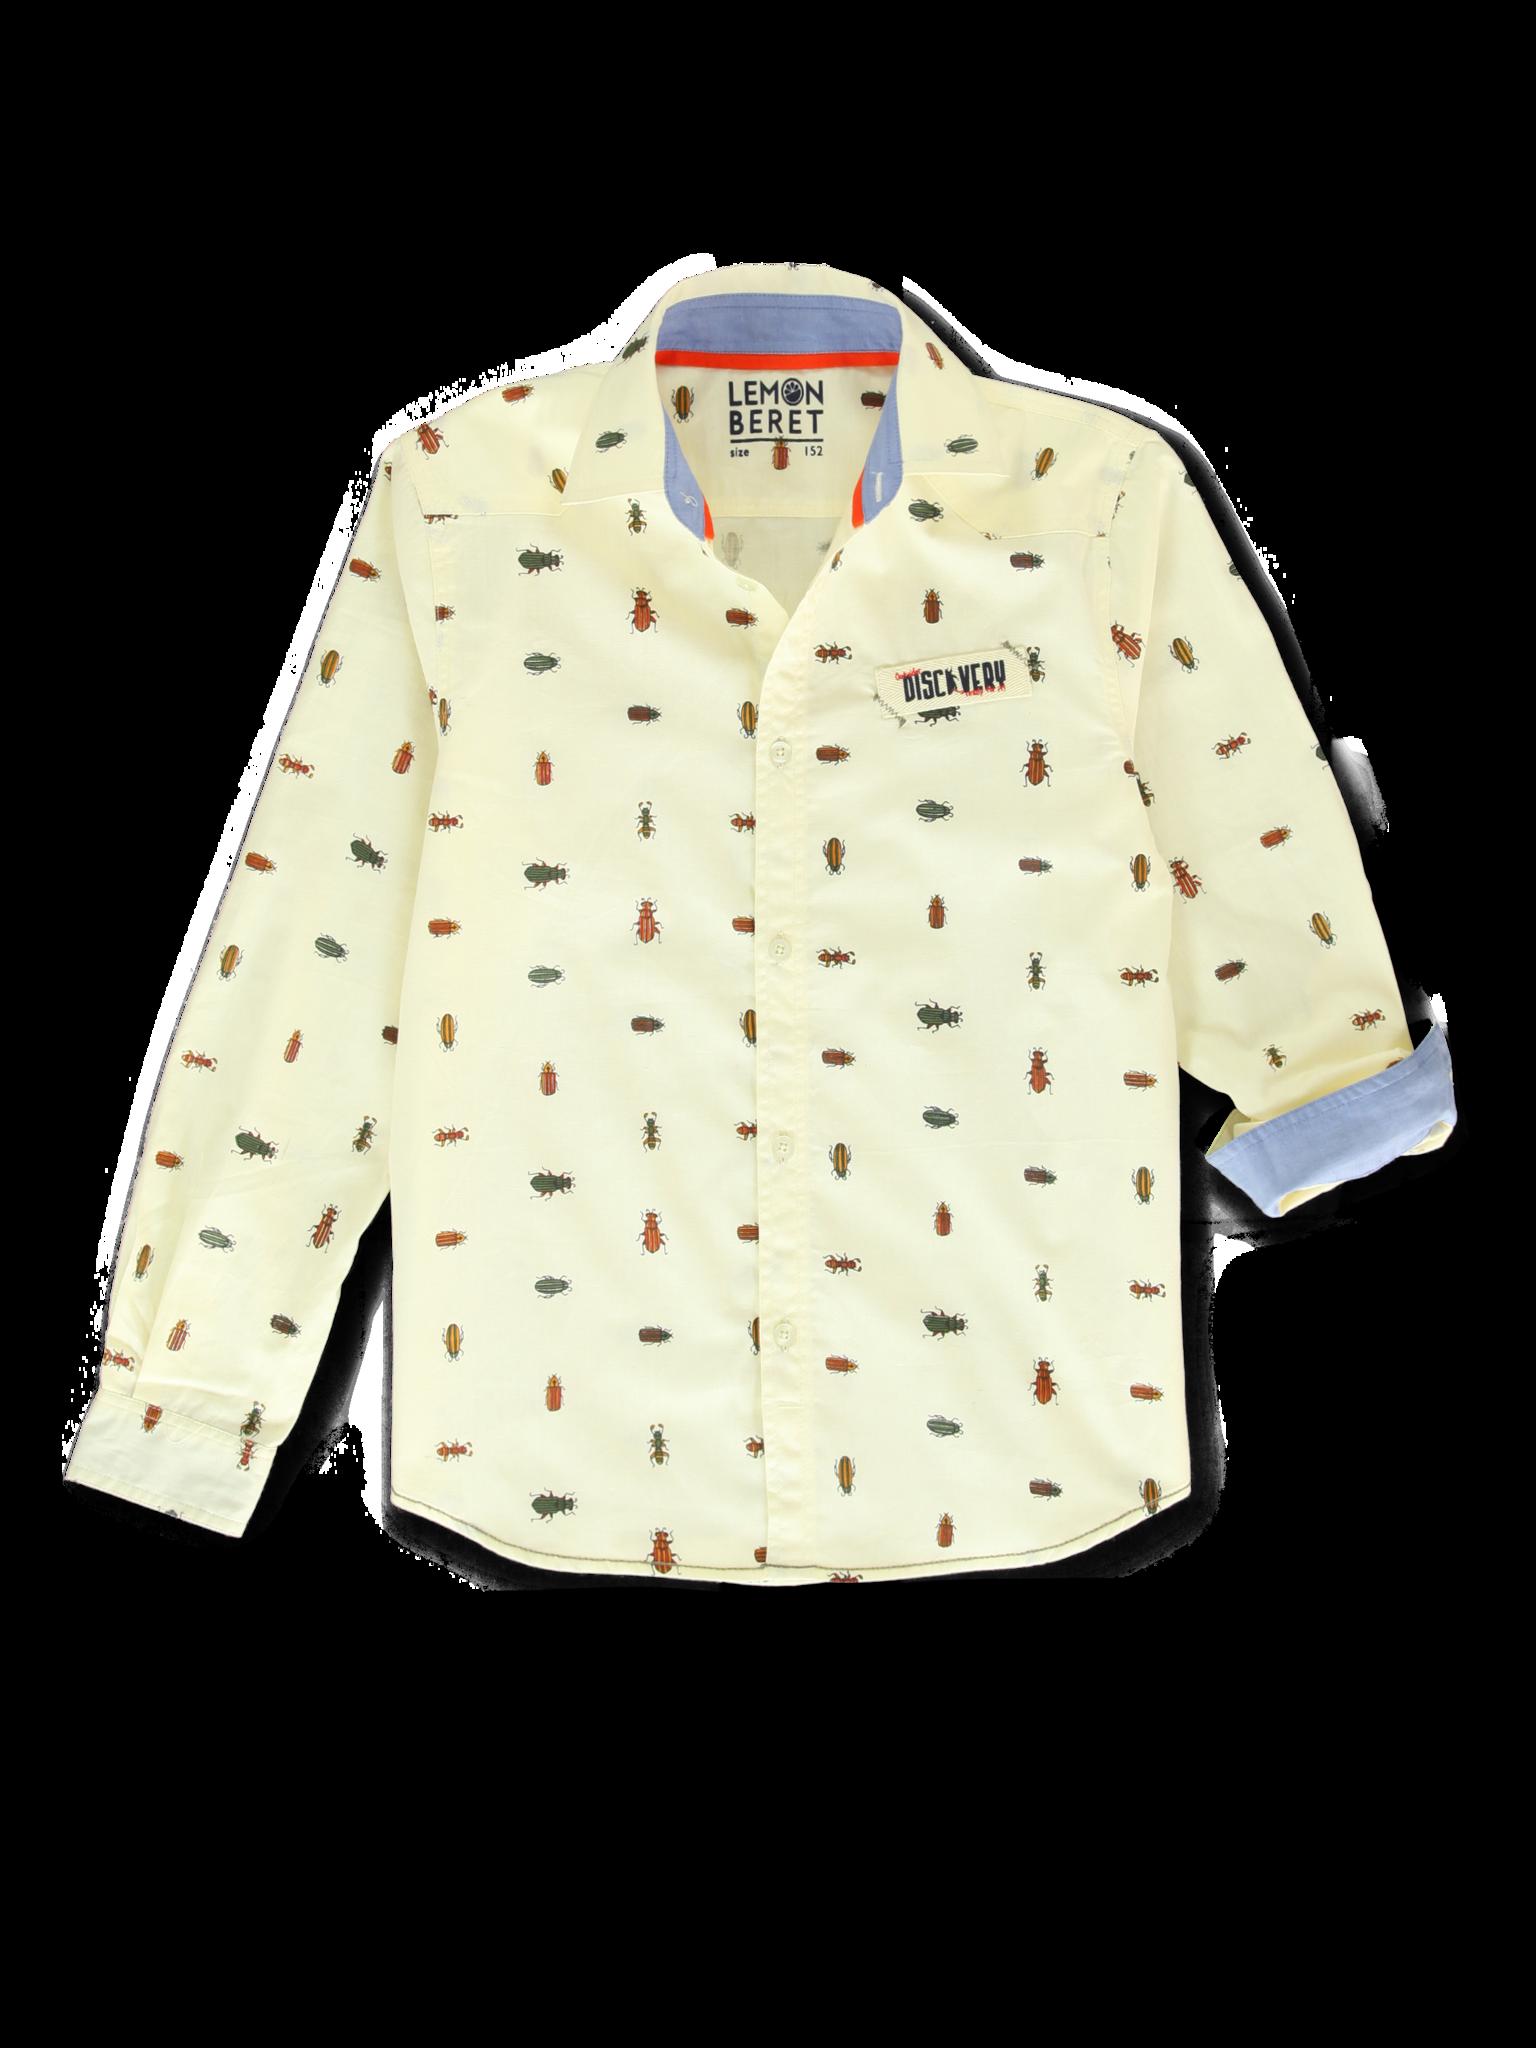 All Brands   Winterproducts Teen Boys   Shirt   10 pcs/box